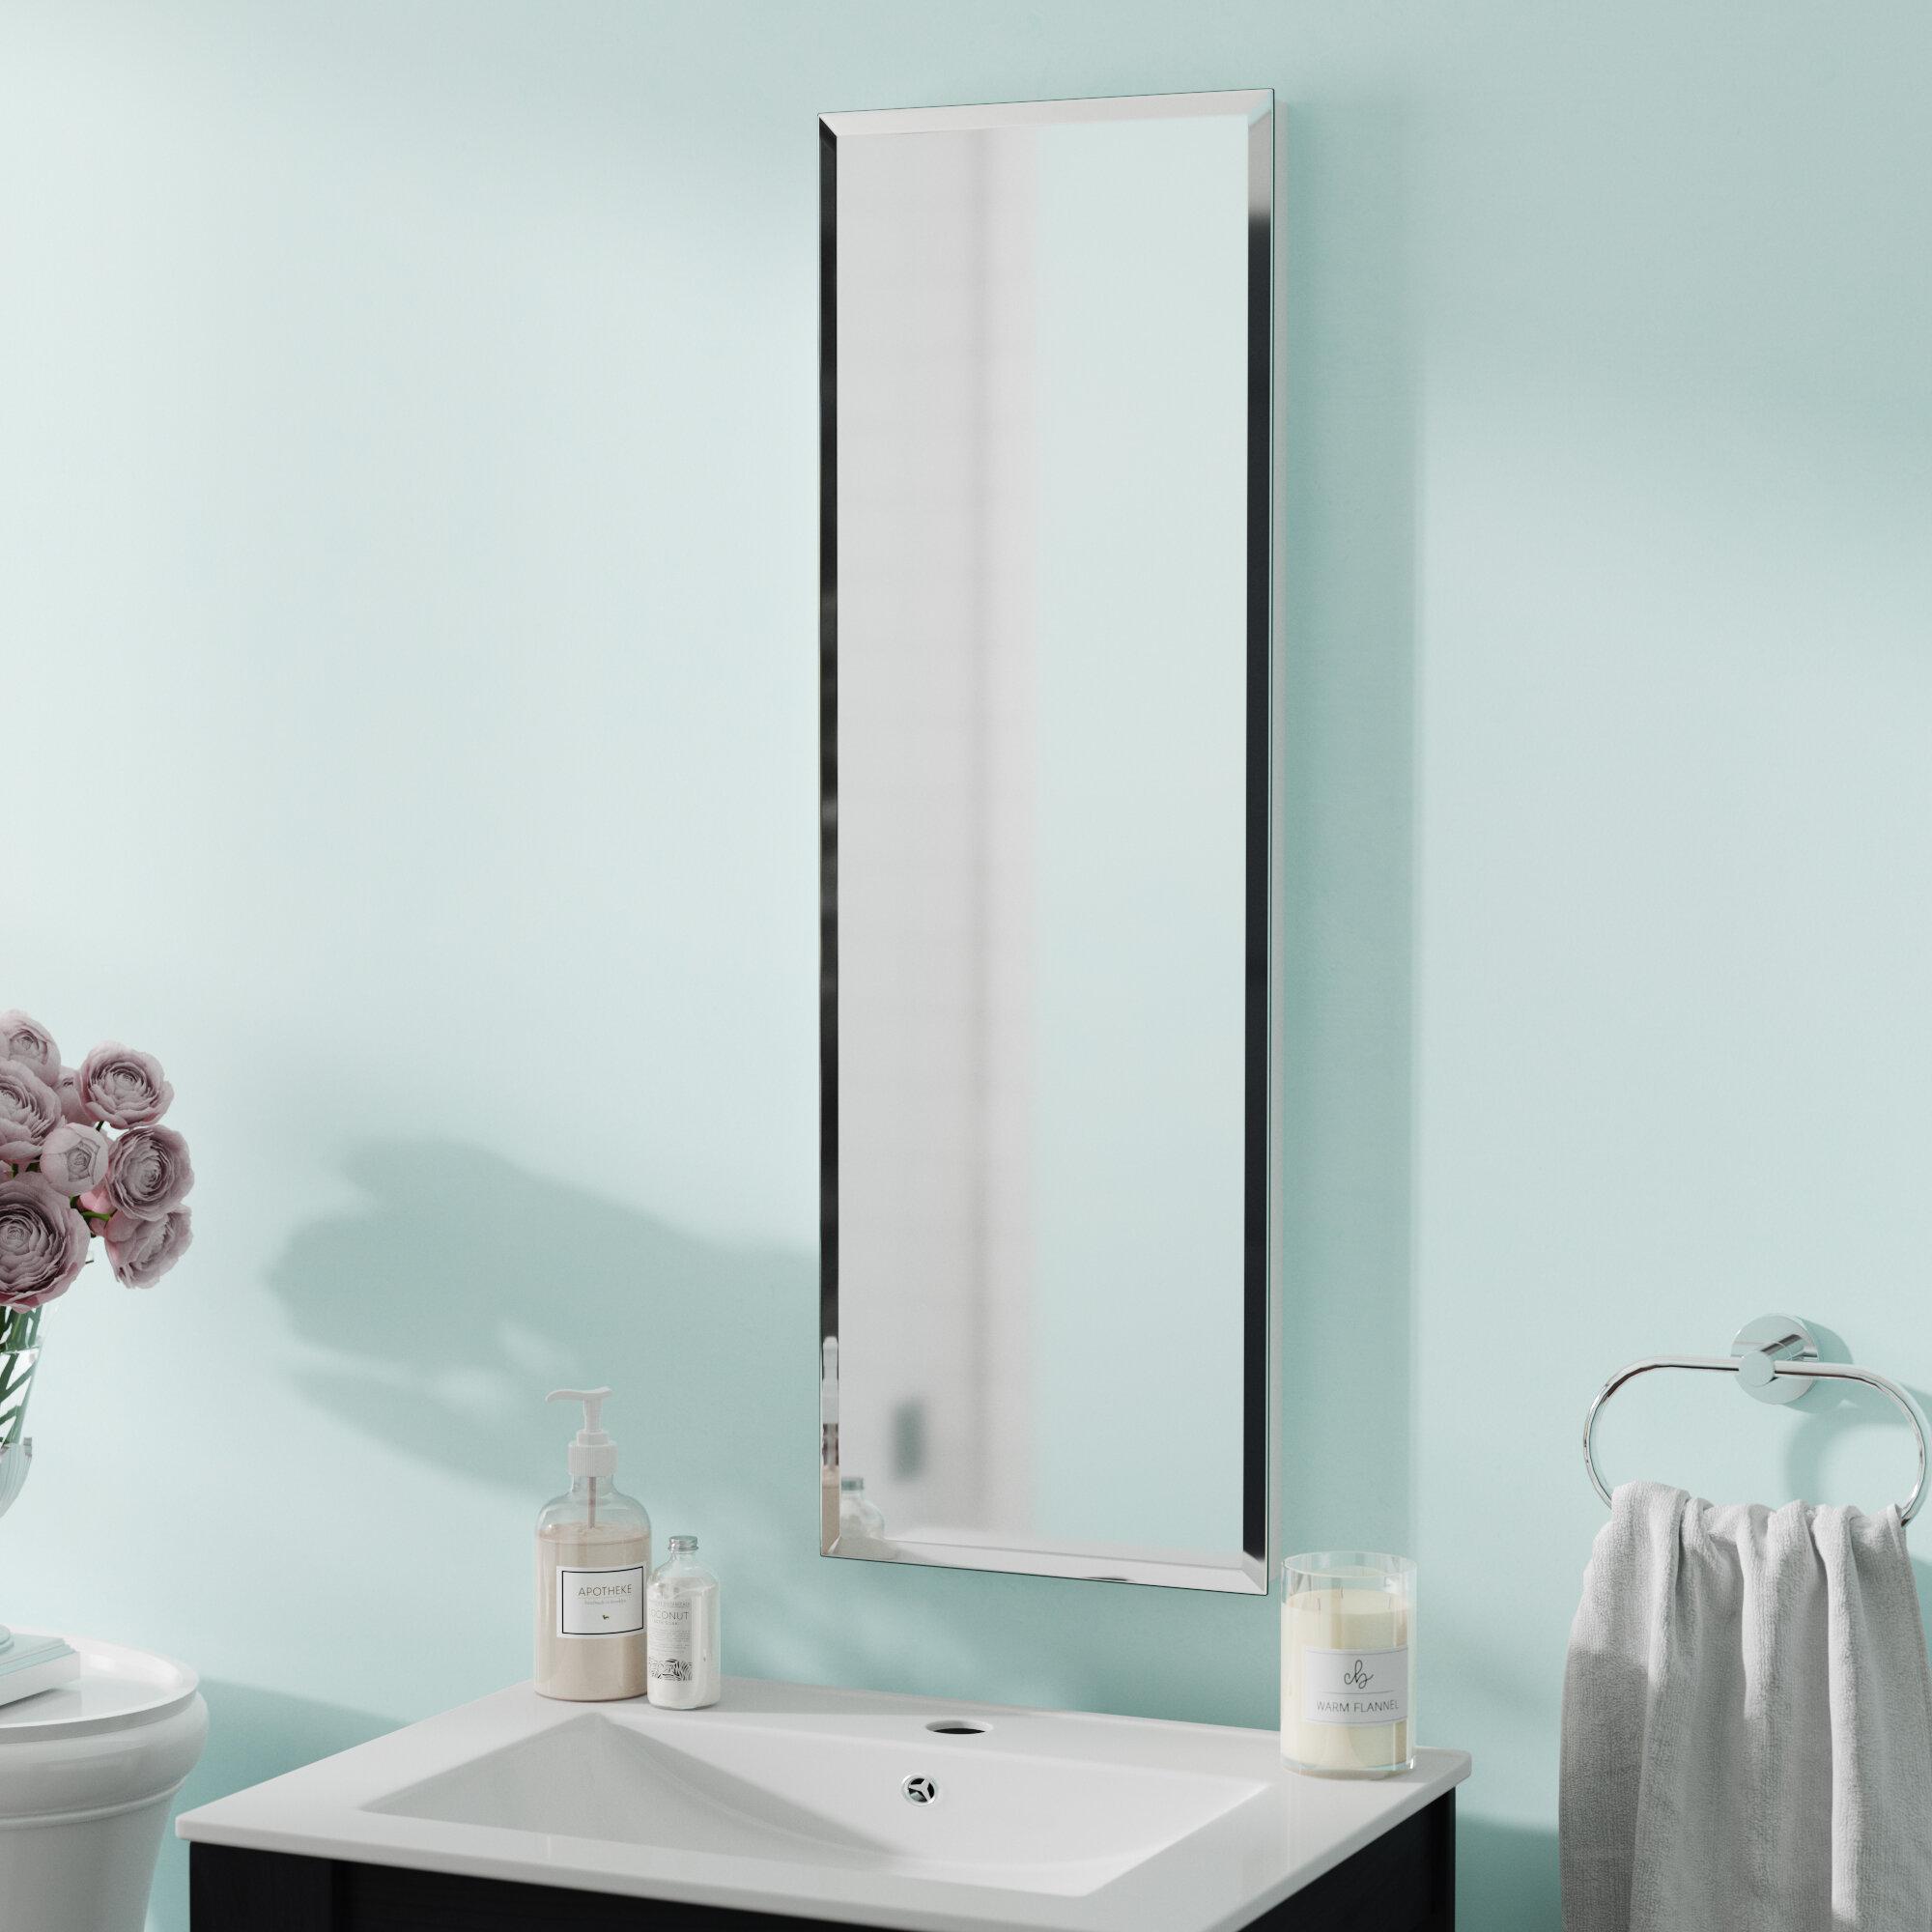 Orren Ellis Ginnifer 12 X 36 Recessed Medicine Cabinet With 4 Adjustable Shelves Reviews Wayfair